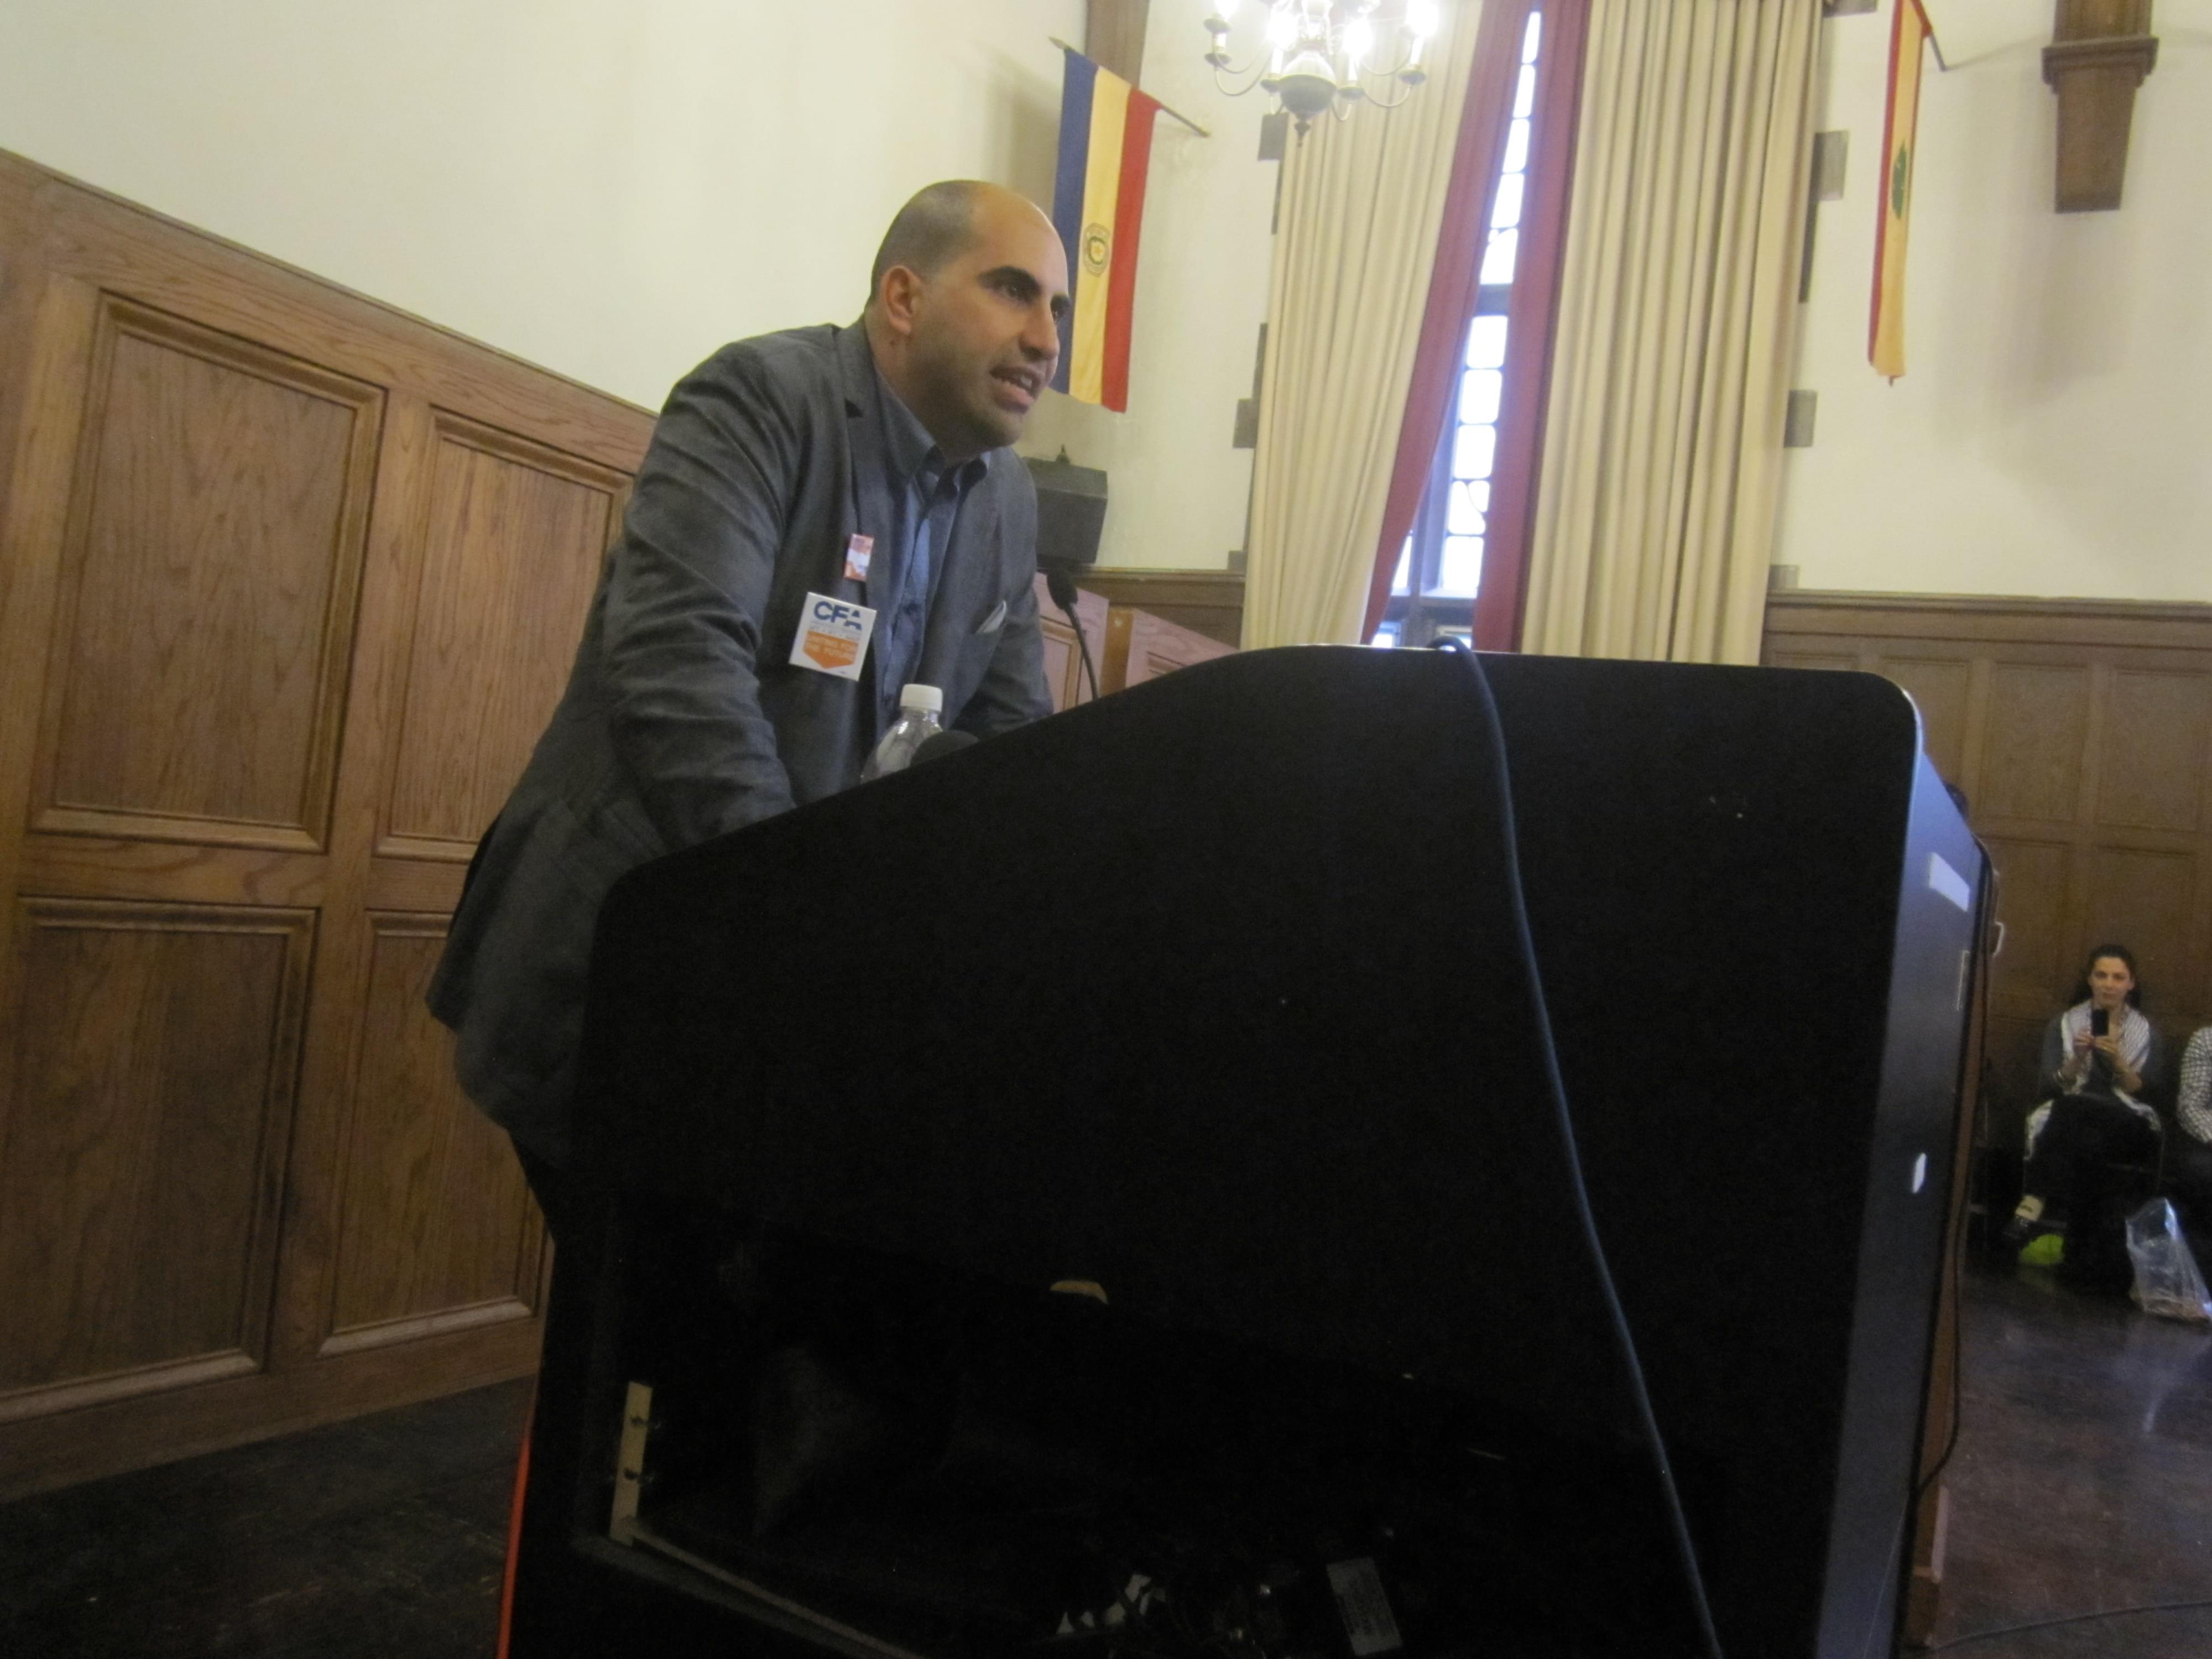 Steven Salaita speaks at the University of Illinois September 9.